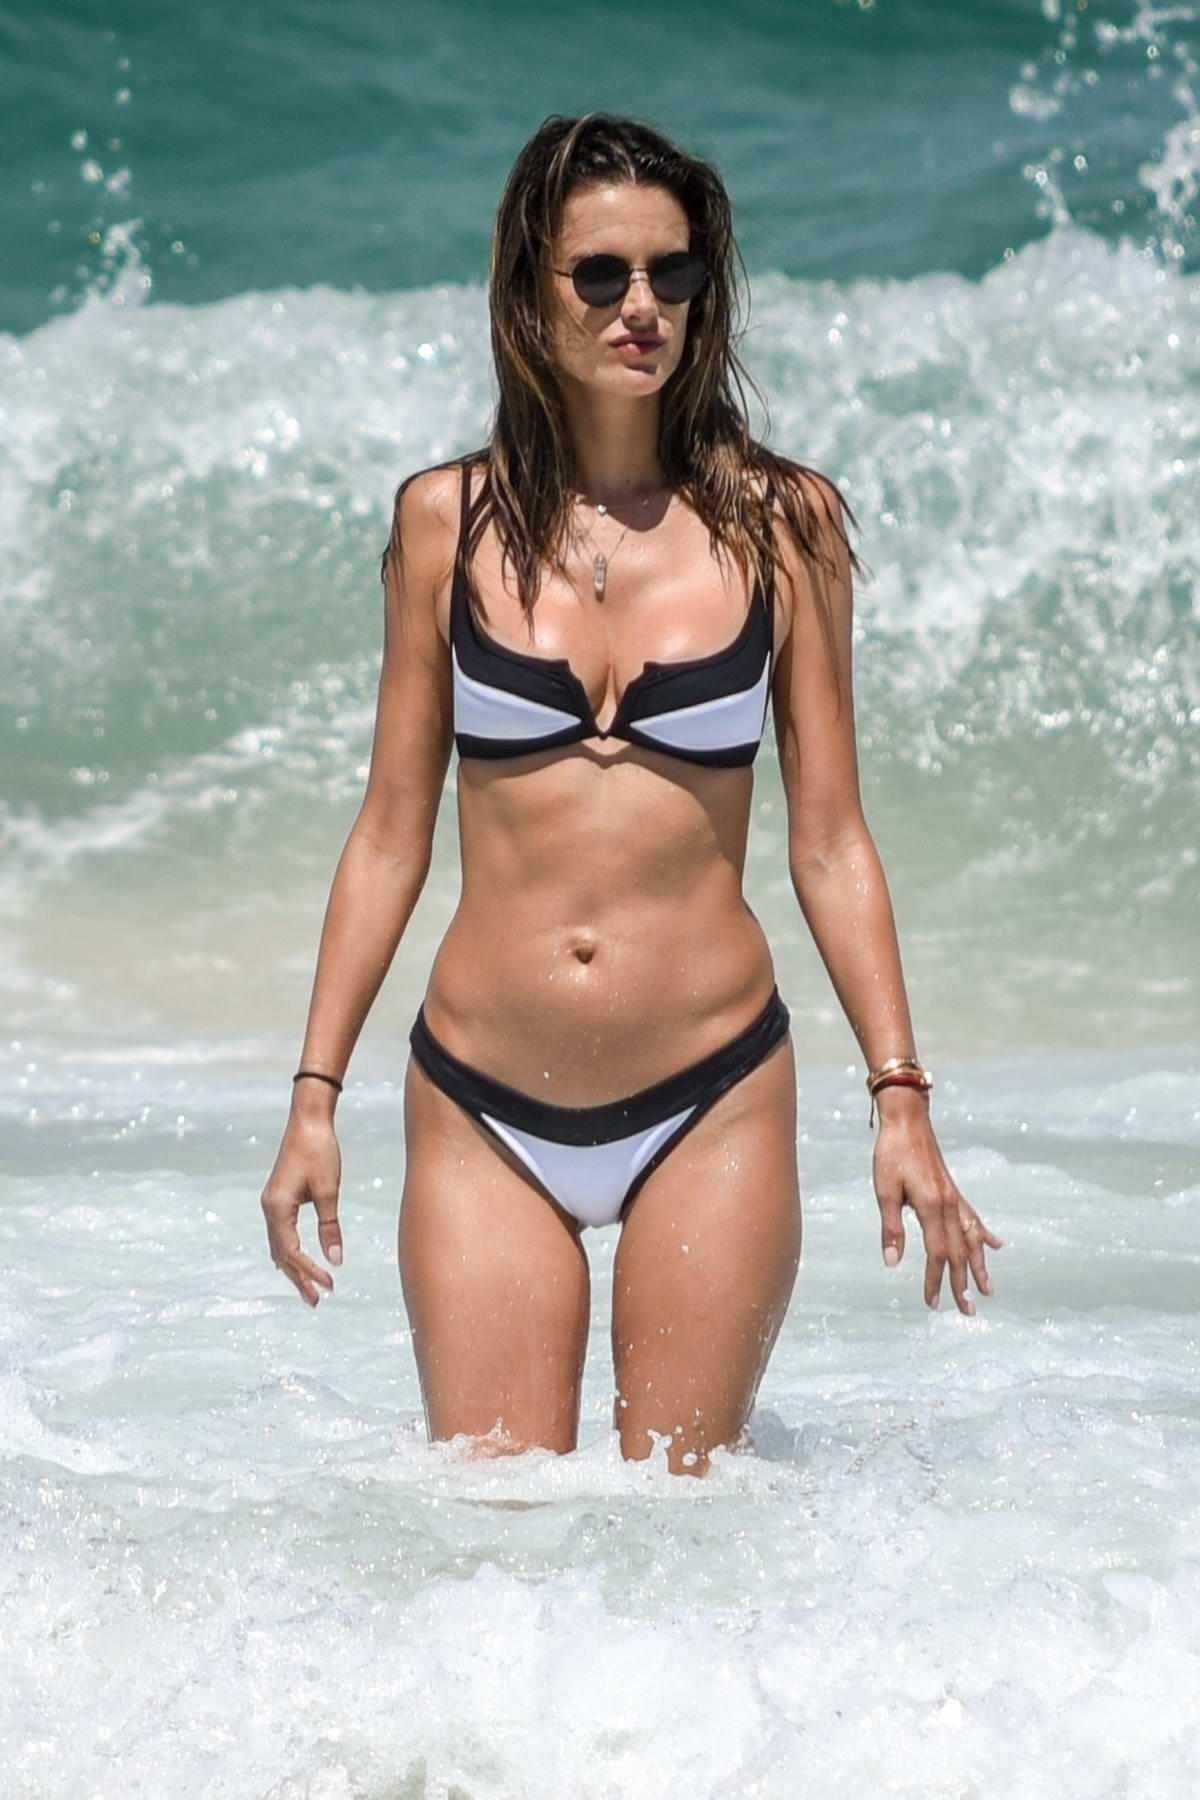 Alessandra Ambrosio wears a black and white bikini while enjoying the beach with boyfriend Nicolo Oddi in Florianopolis, Brazil